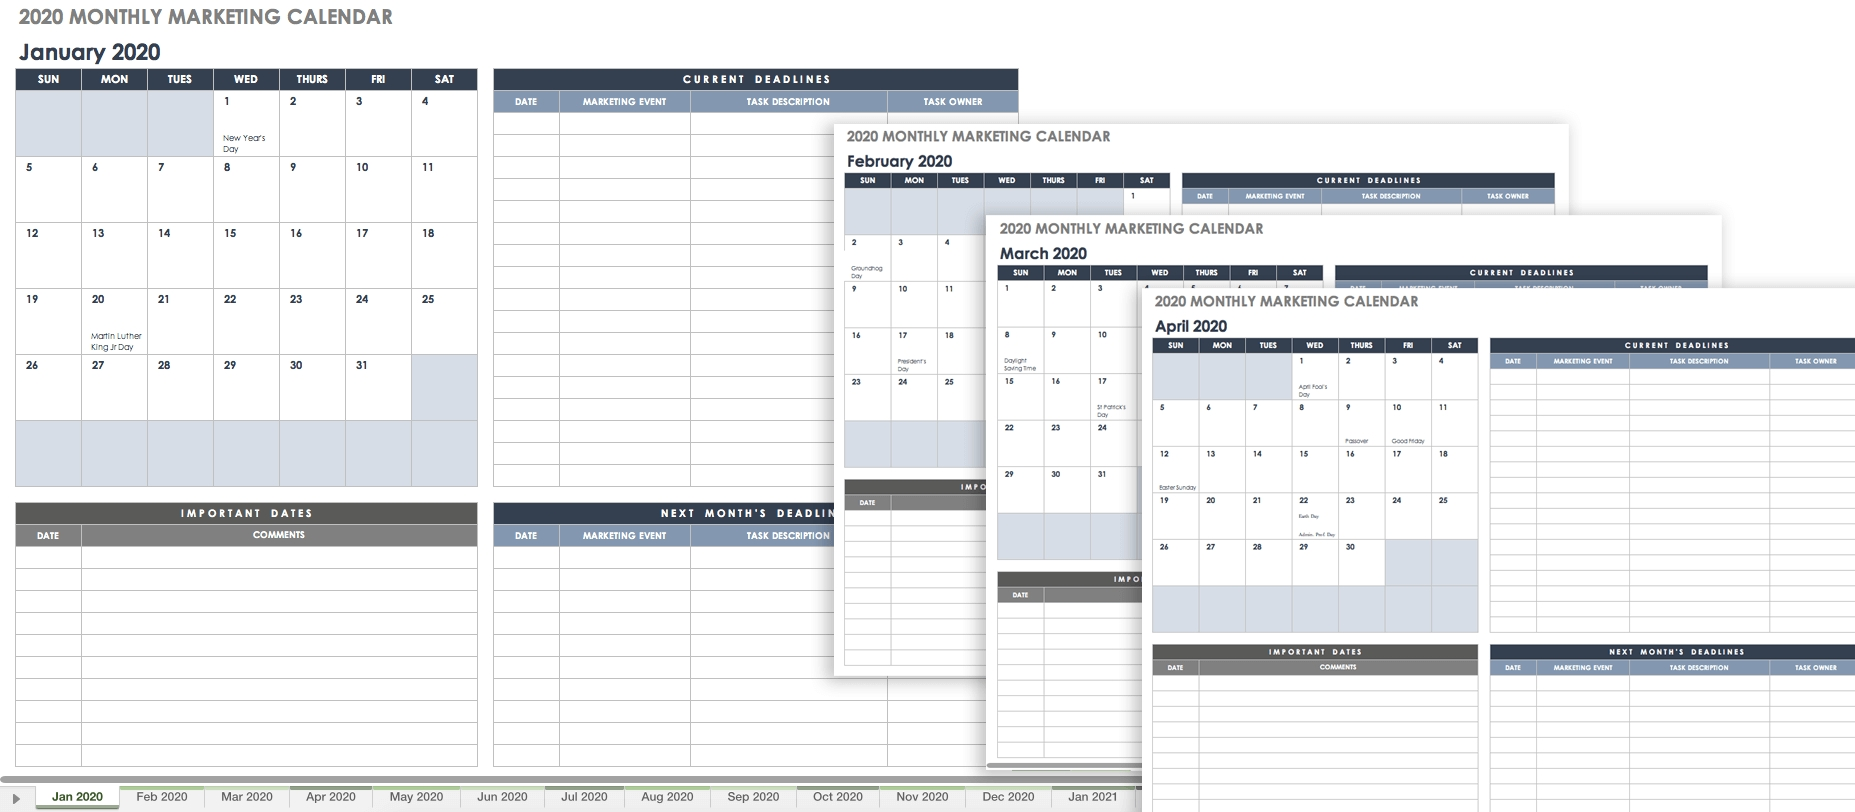 9 Free Marketing Calendar Templates For Excel - Smartsheet regarding Action Time And Calendar Templates